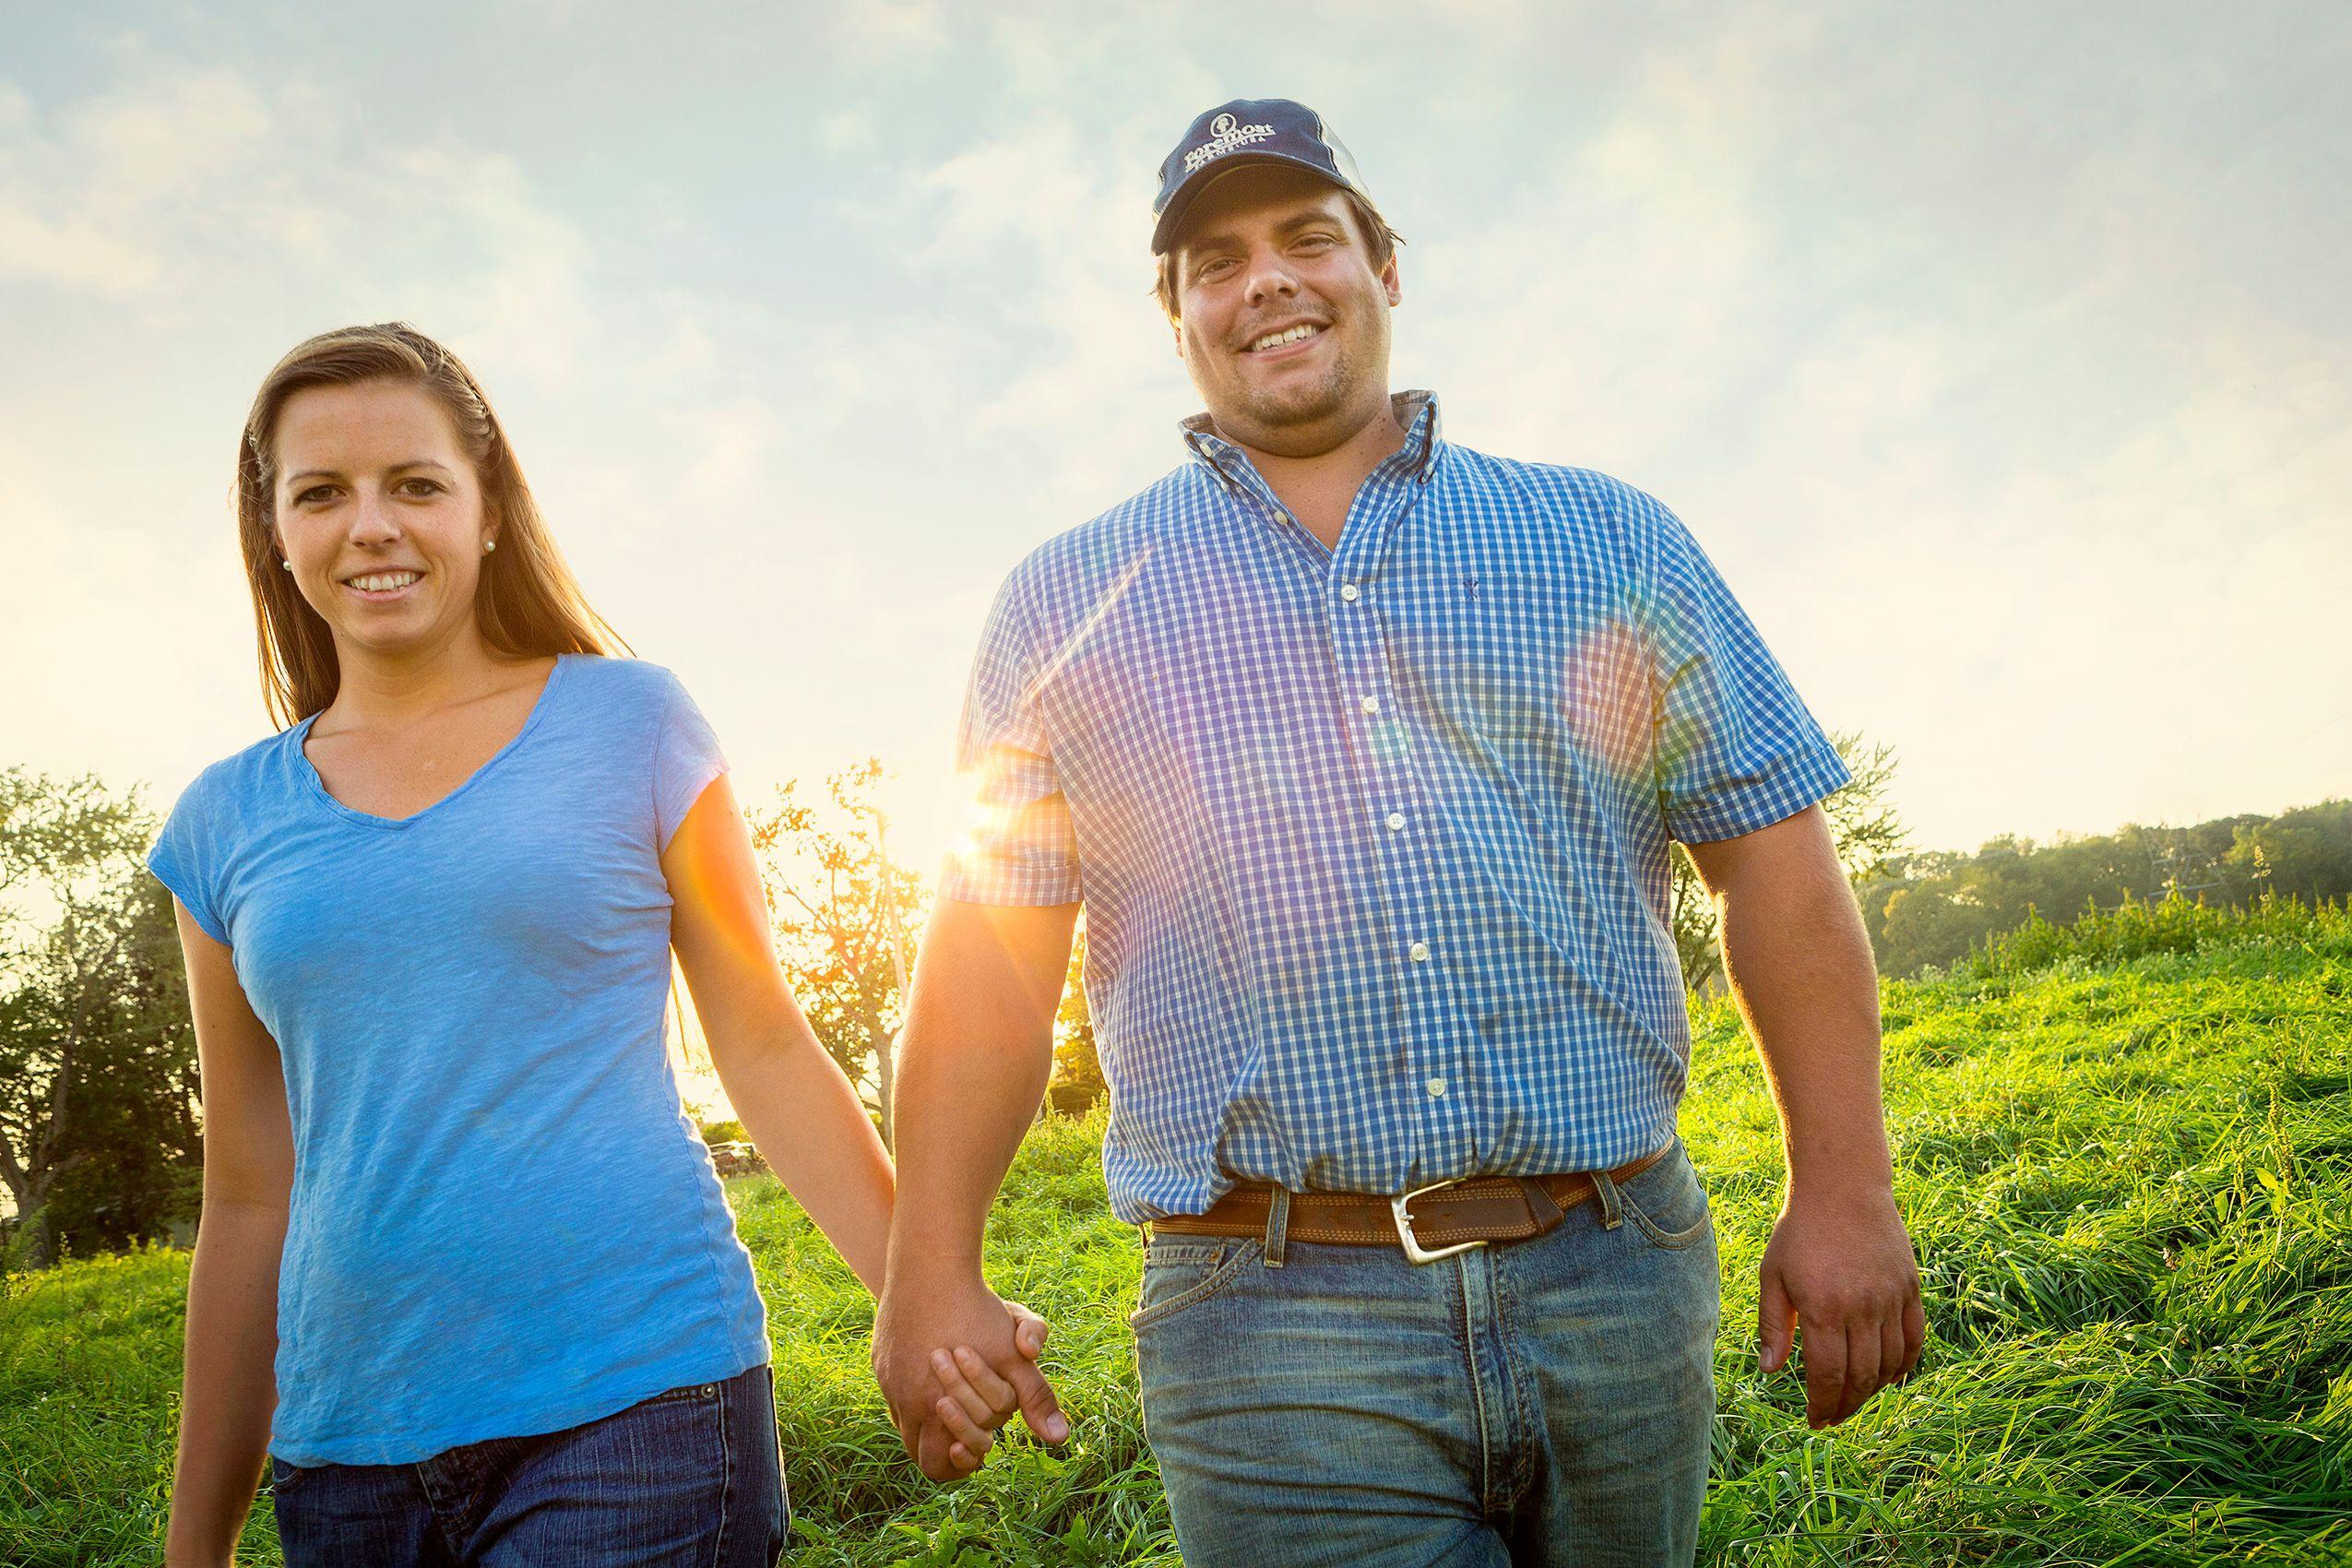 Farm_Couple_HARP3121_F_W.jpg